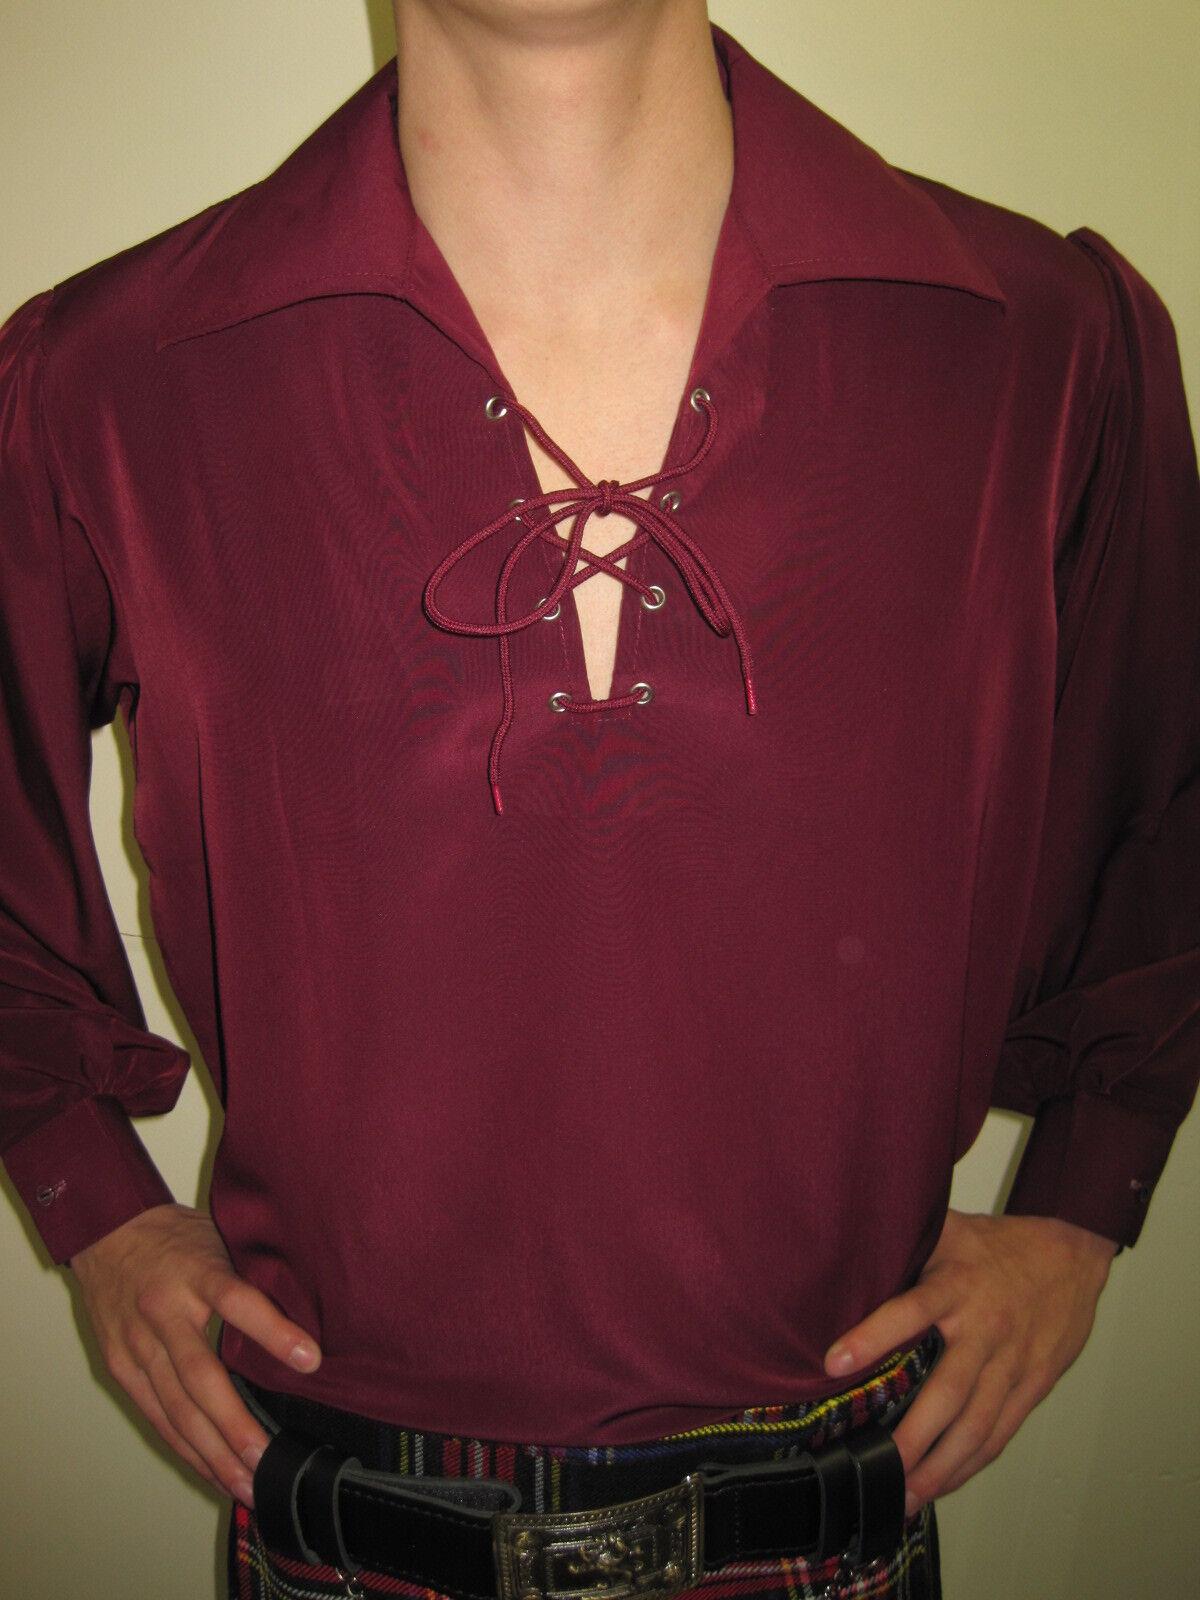 Maroon Jacobite Ghillie Kilt Shirt Small, Med, Large, Xl, 2xl, 3xl, 4xl